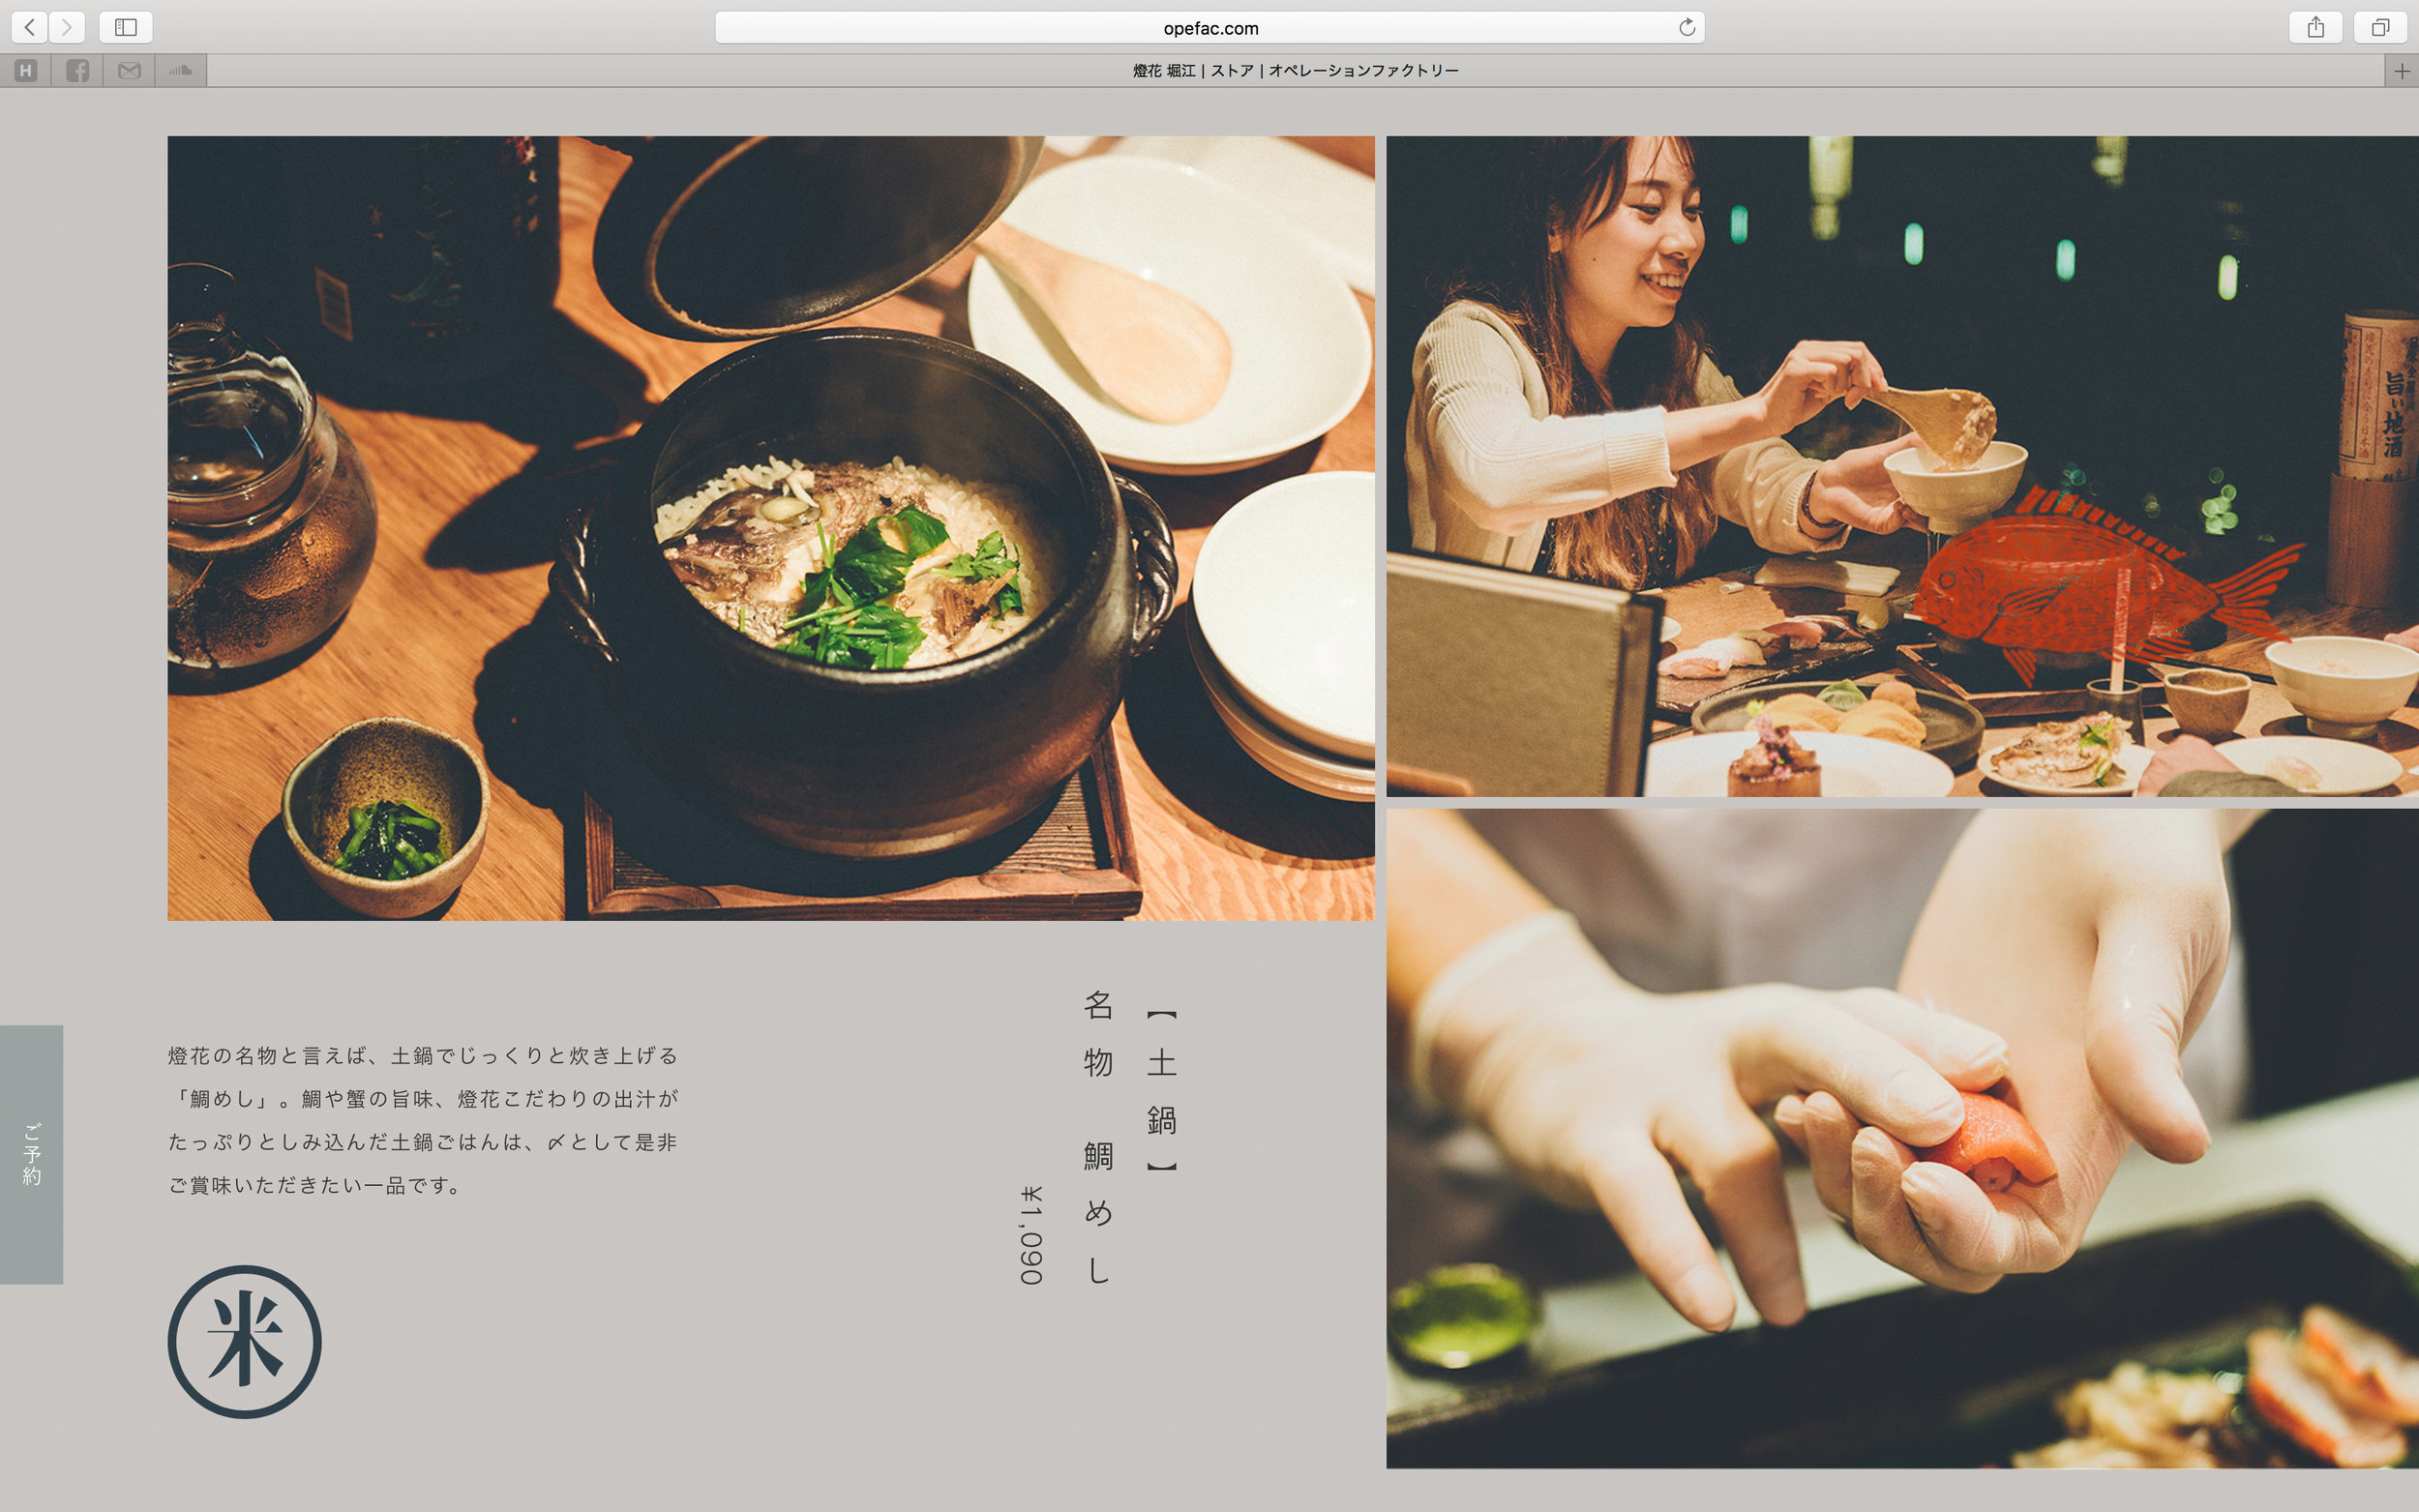 of_web-89.jpg